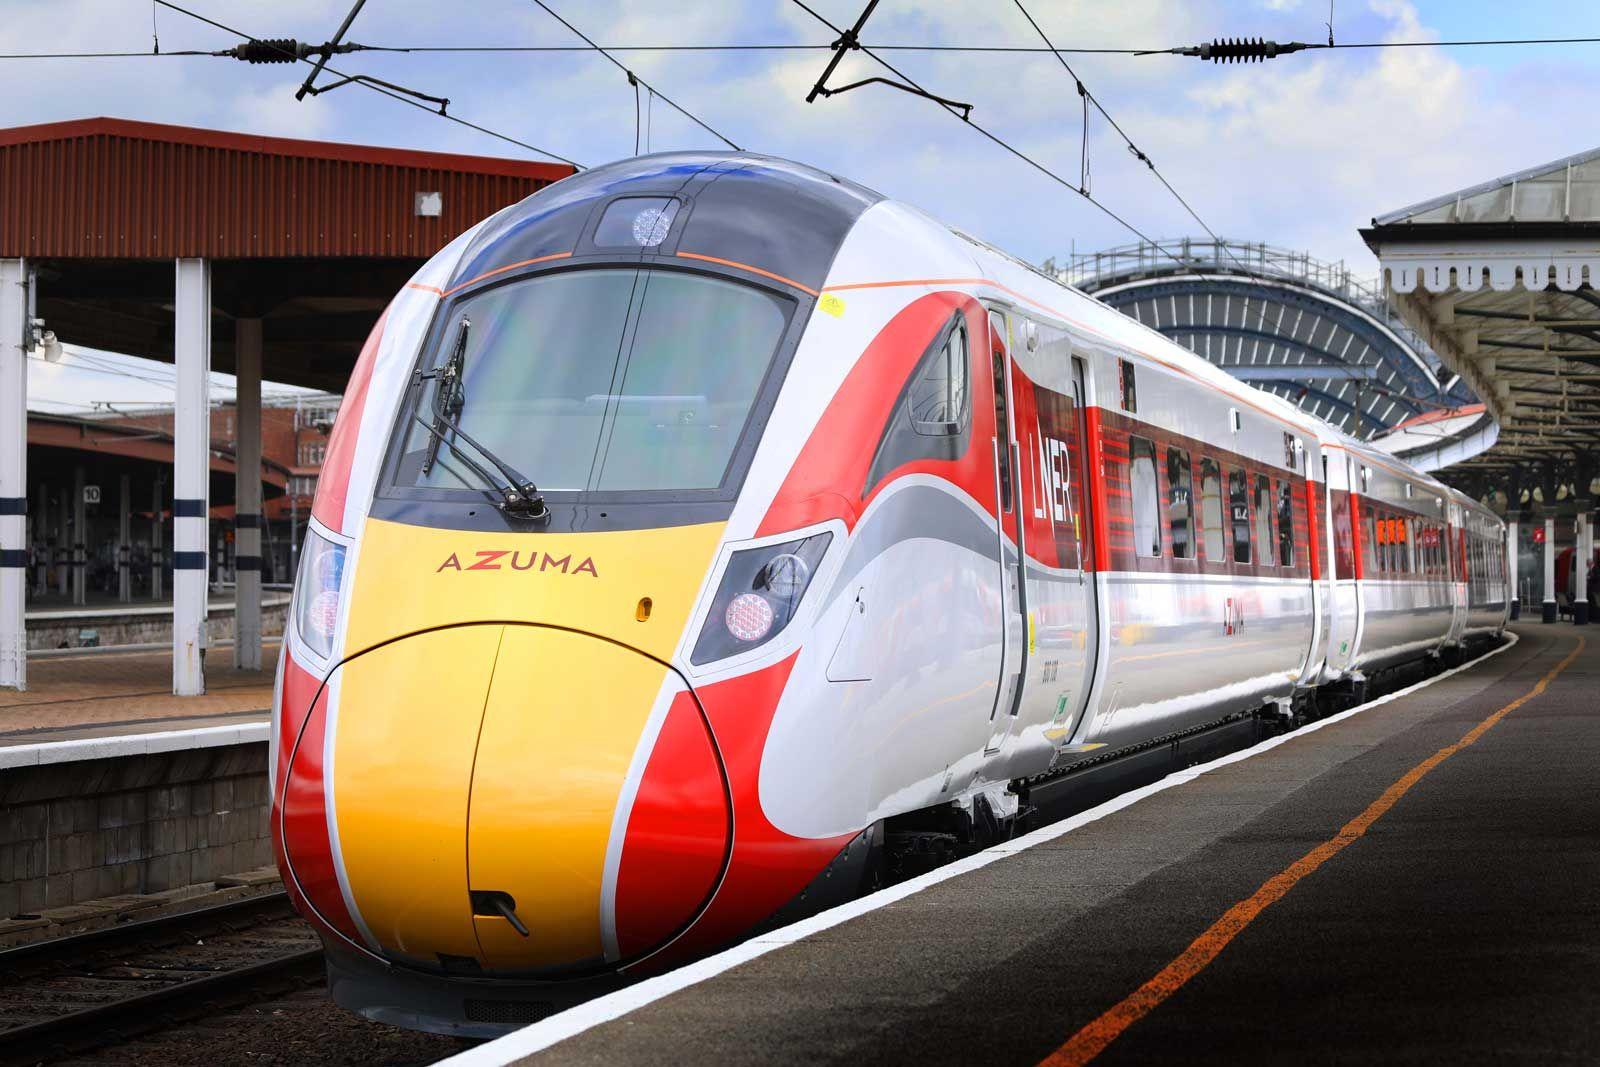 Image showing an LNER Azuma train